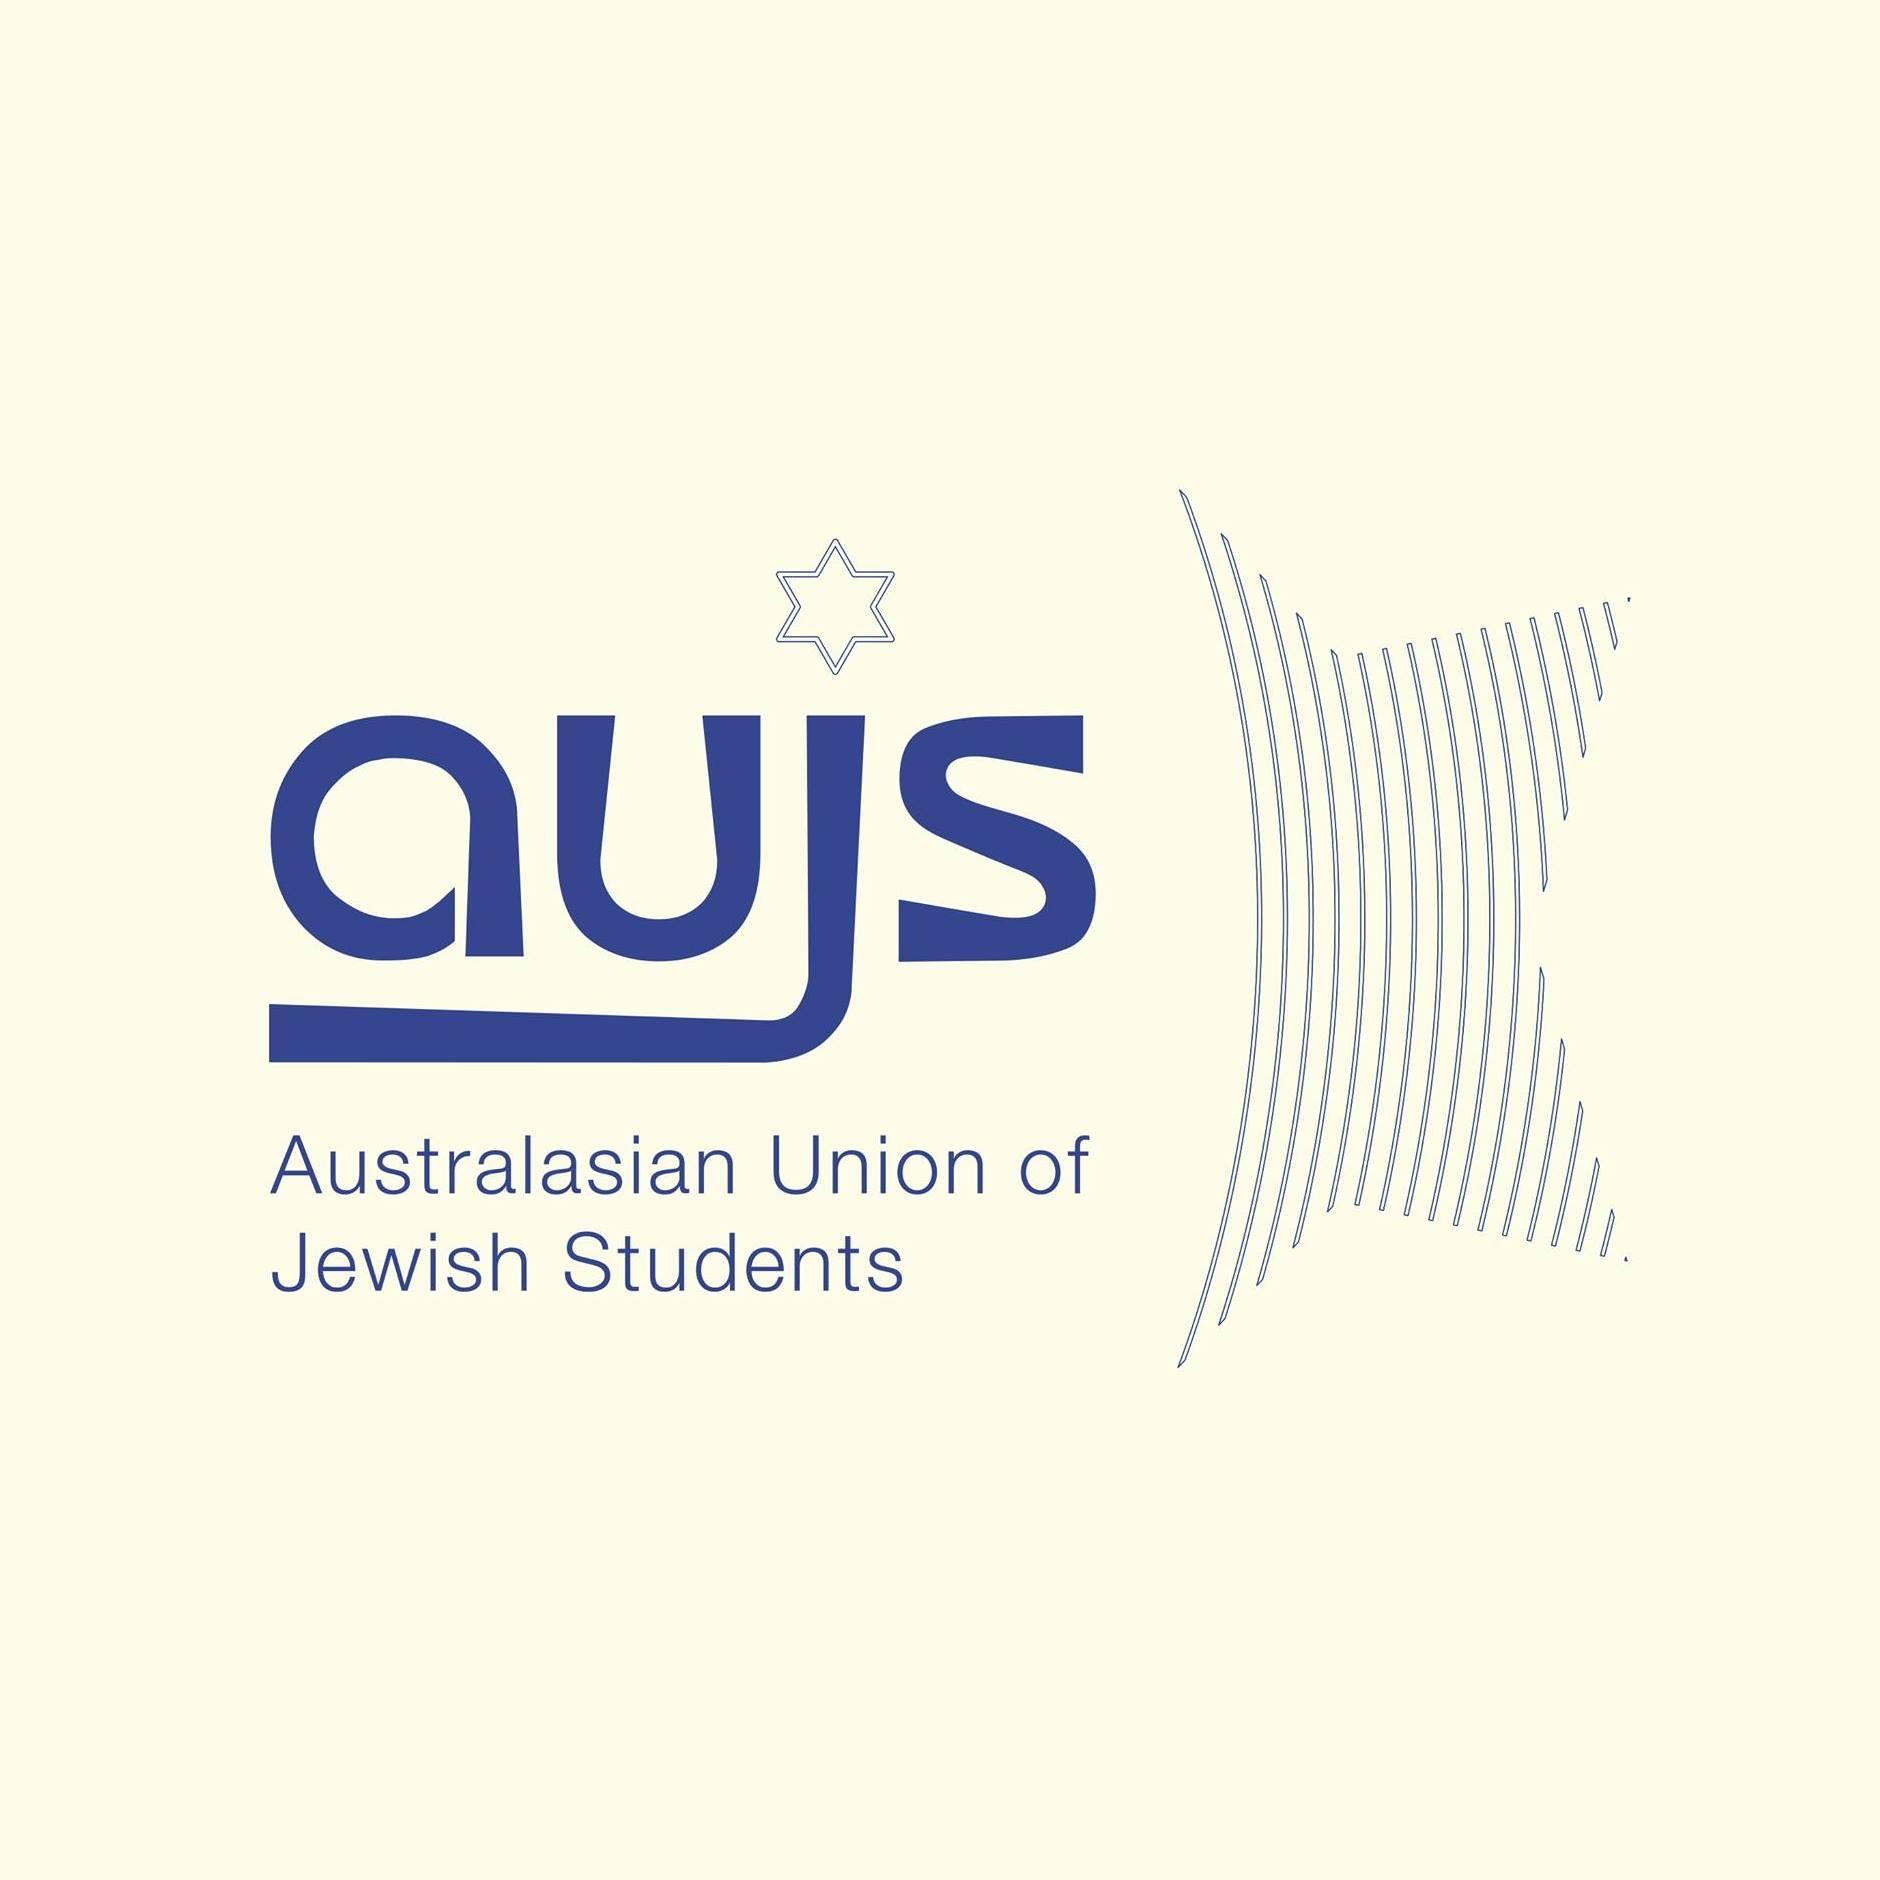 UniClubs - Australasian Union of Jewish Students Logo